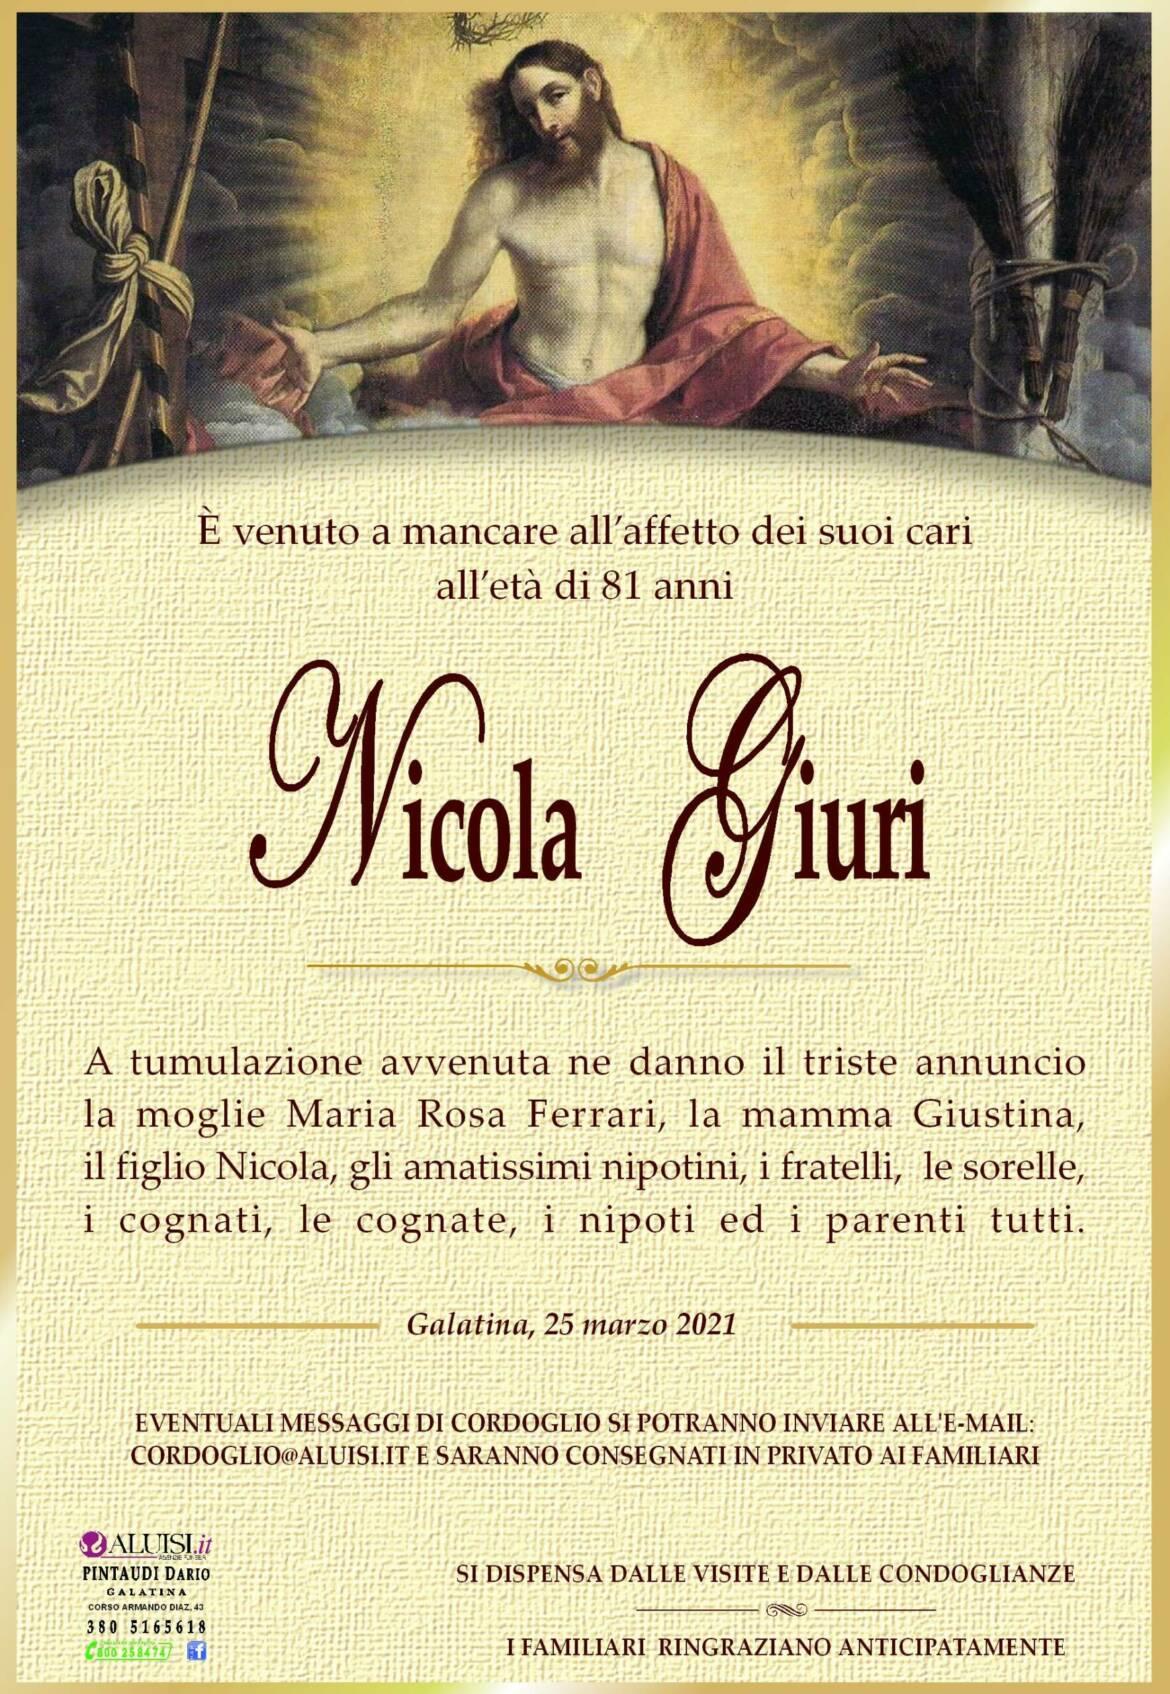 Annuncio-NICOLA-GALATINA-2-scaled.jpg